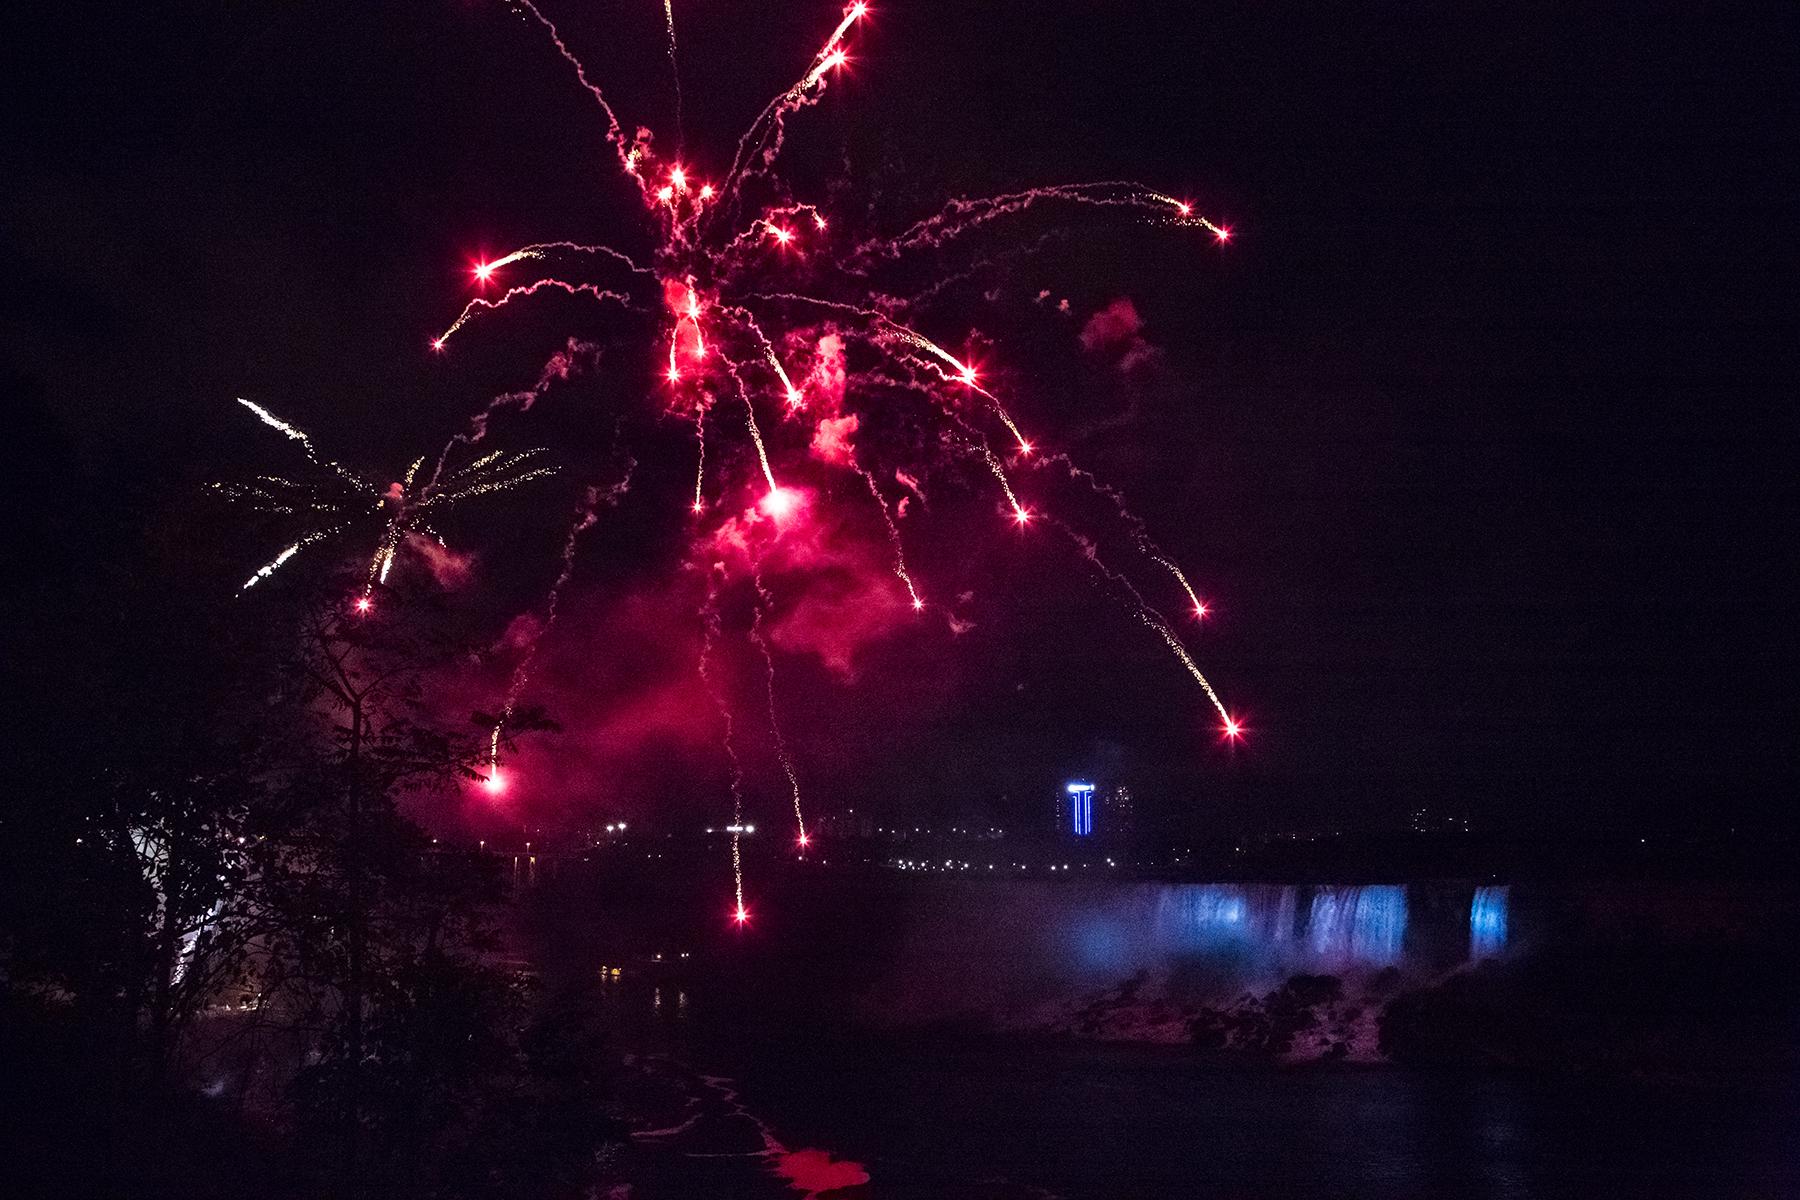 voyage-USA-niagara-2014-marie-colette-becker-20